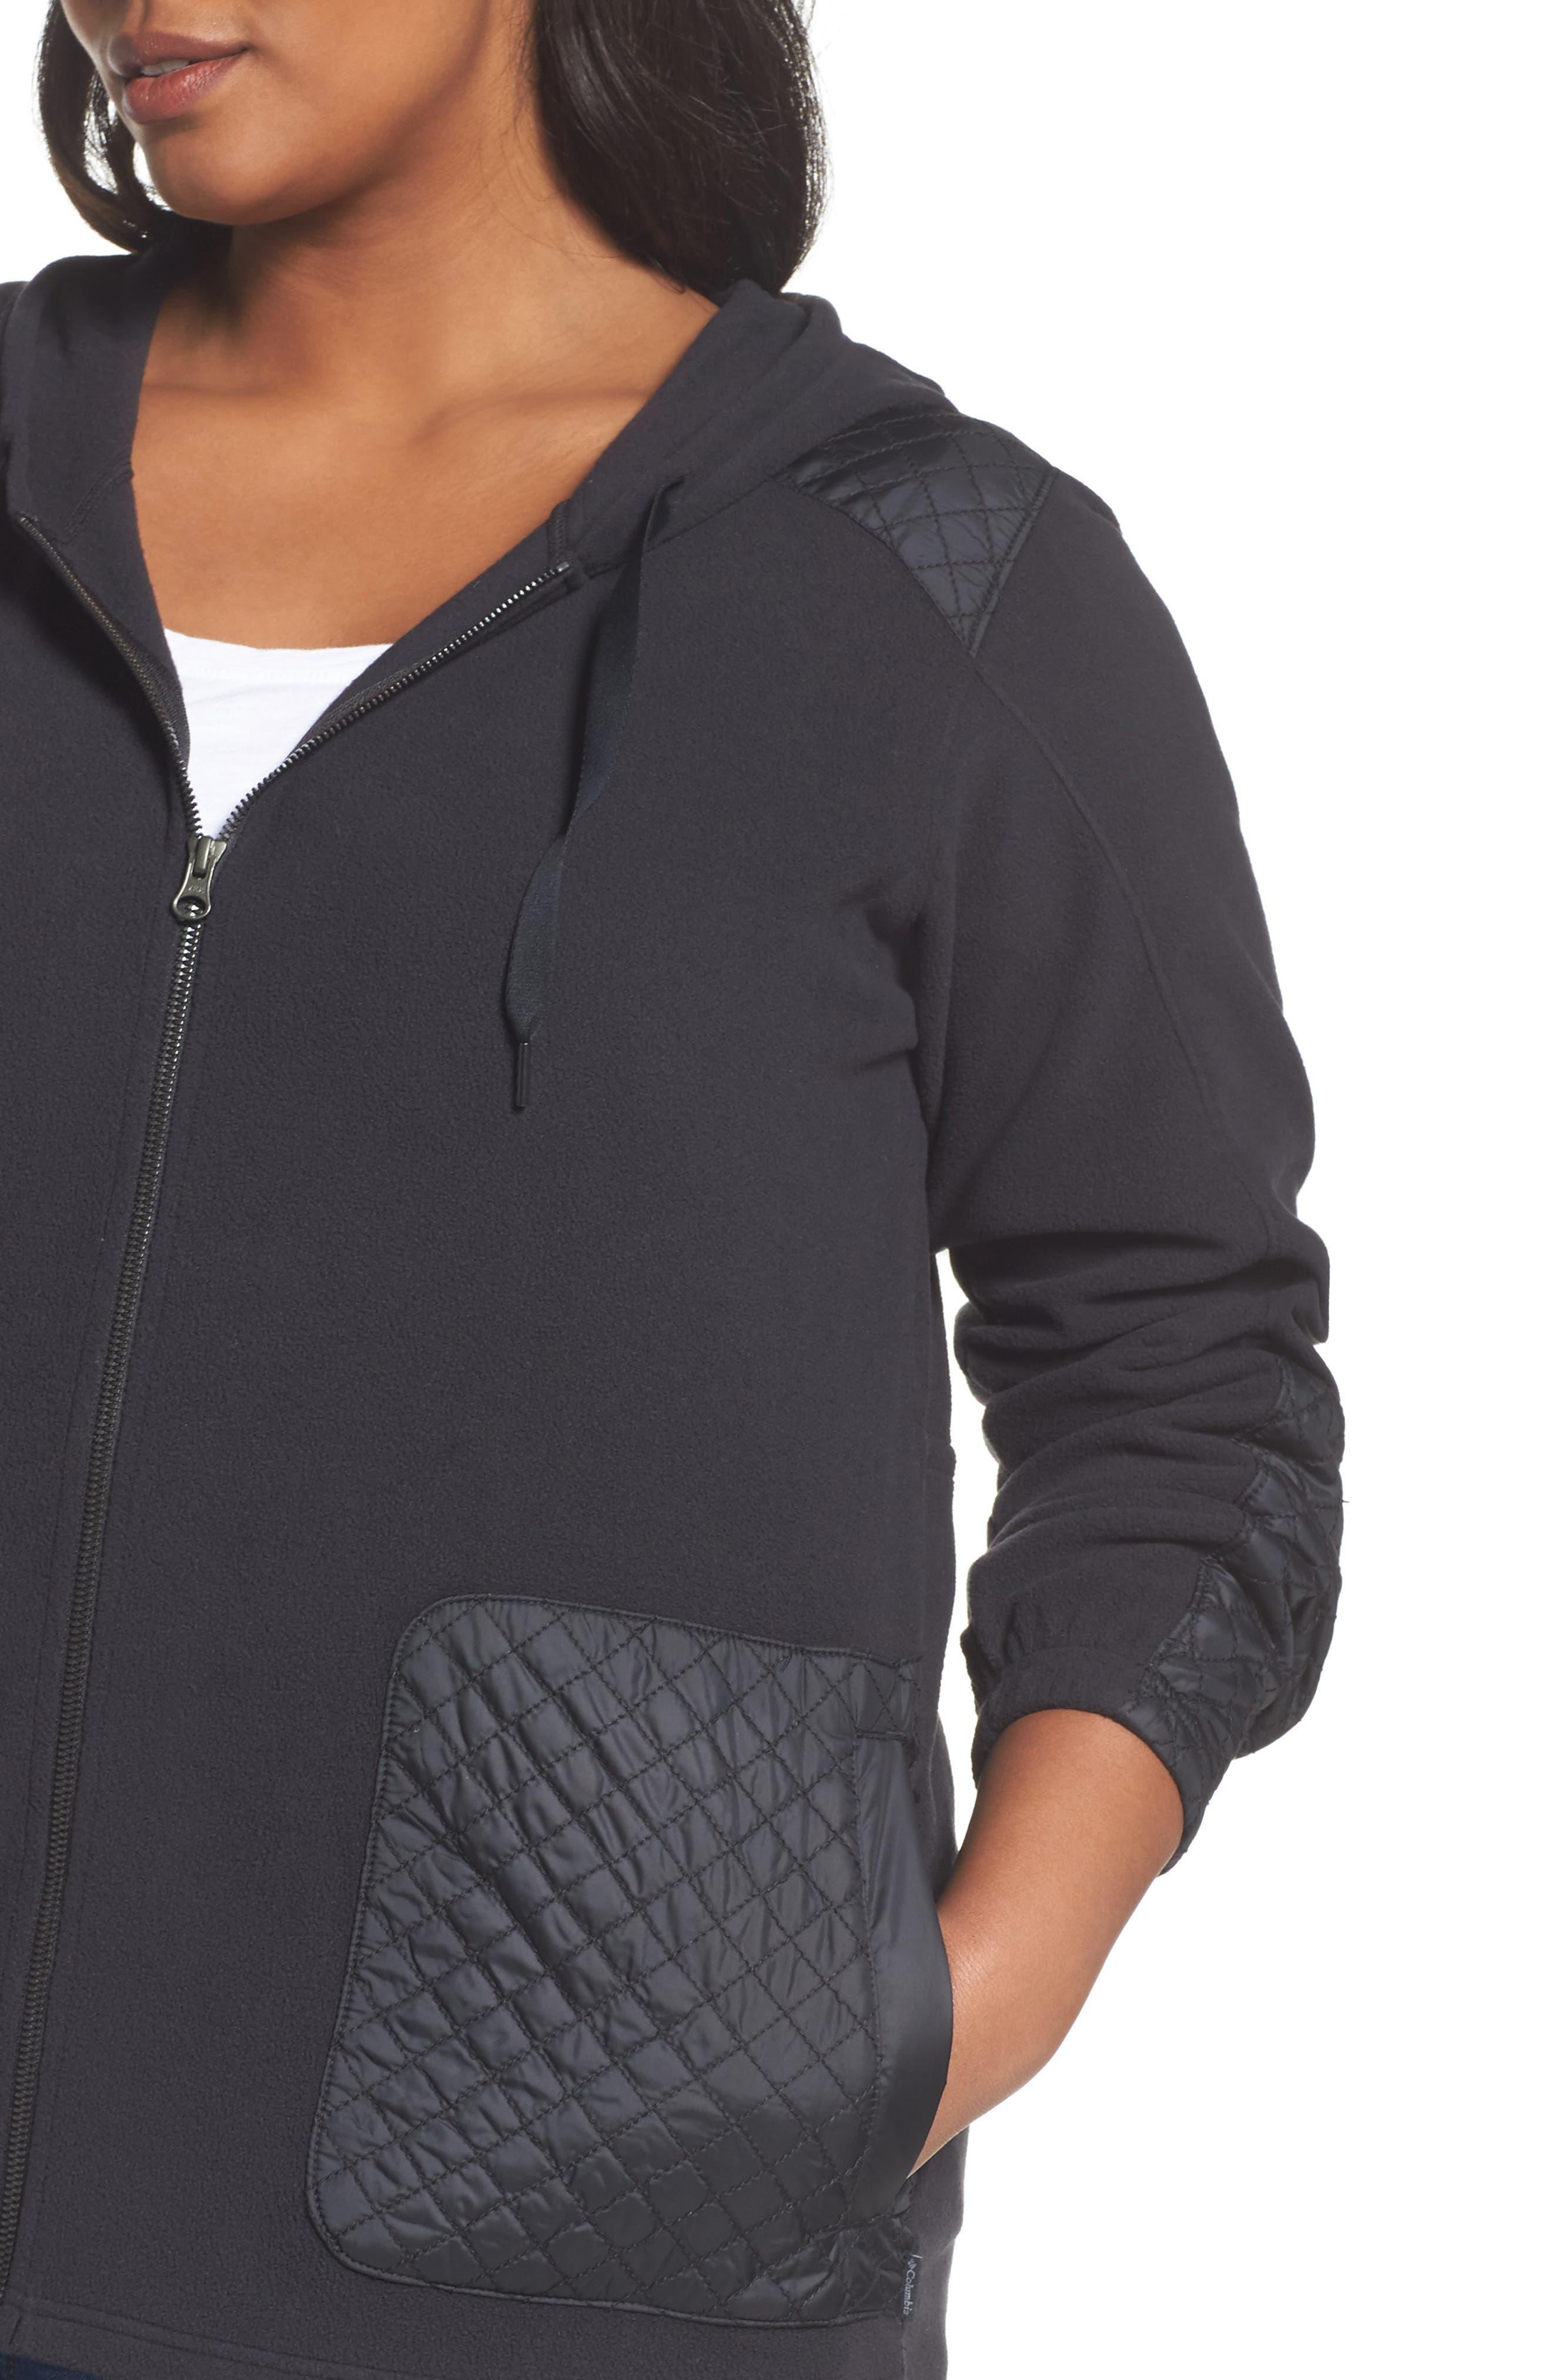 Warm Up Hooded Fleece Jacket,                             Alternate thumbnail 4, color,                             010